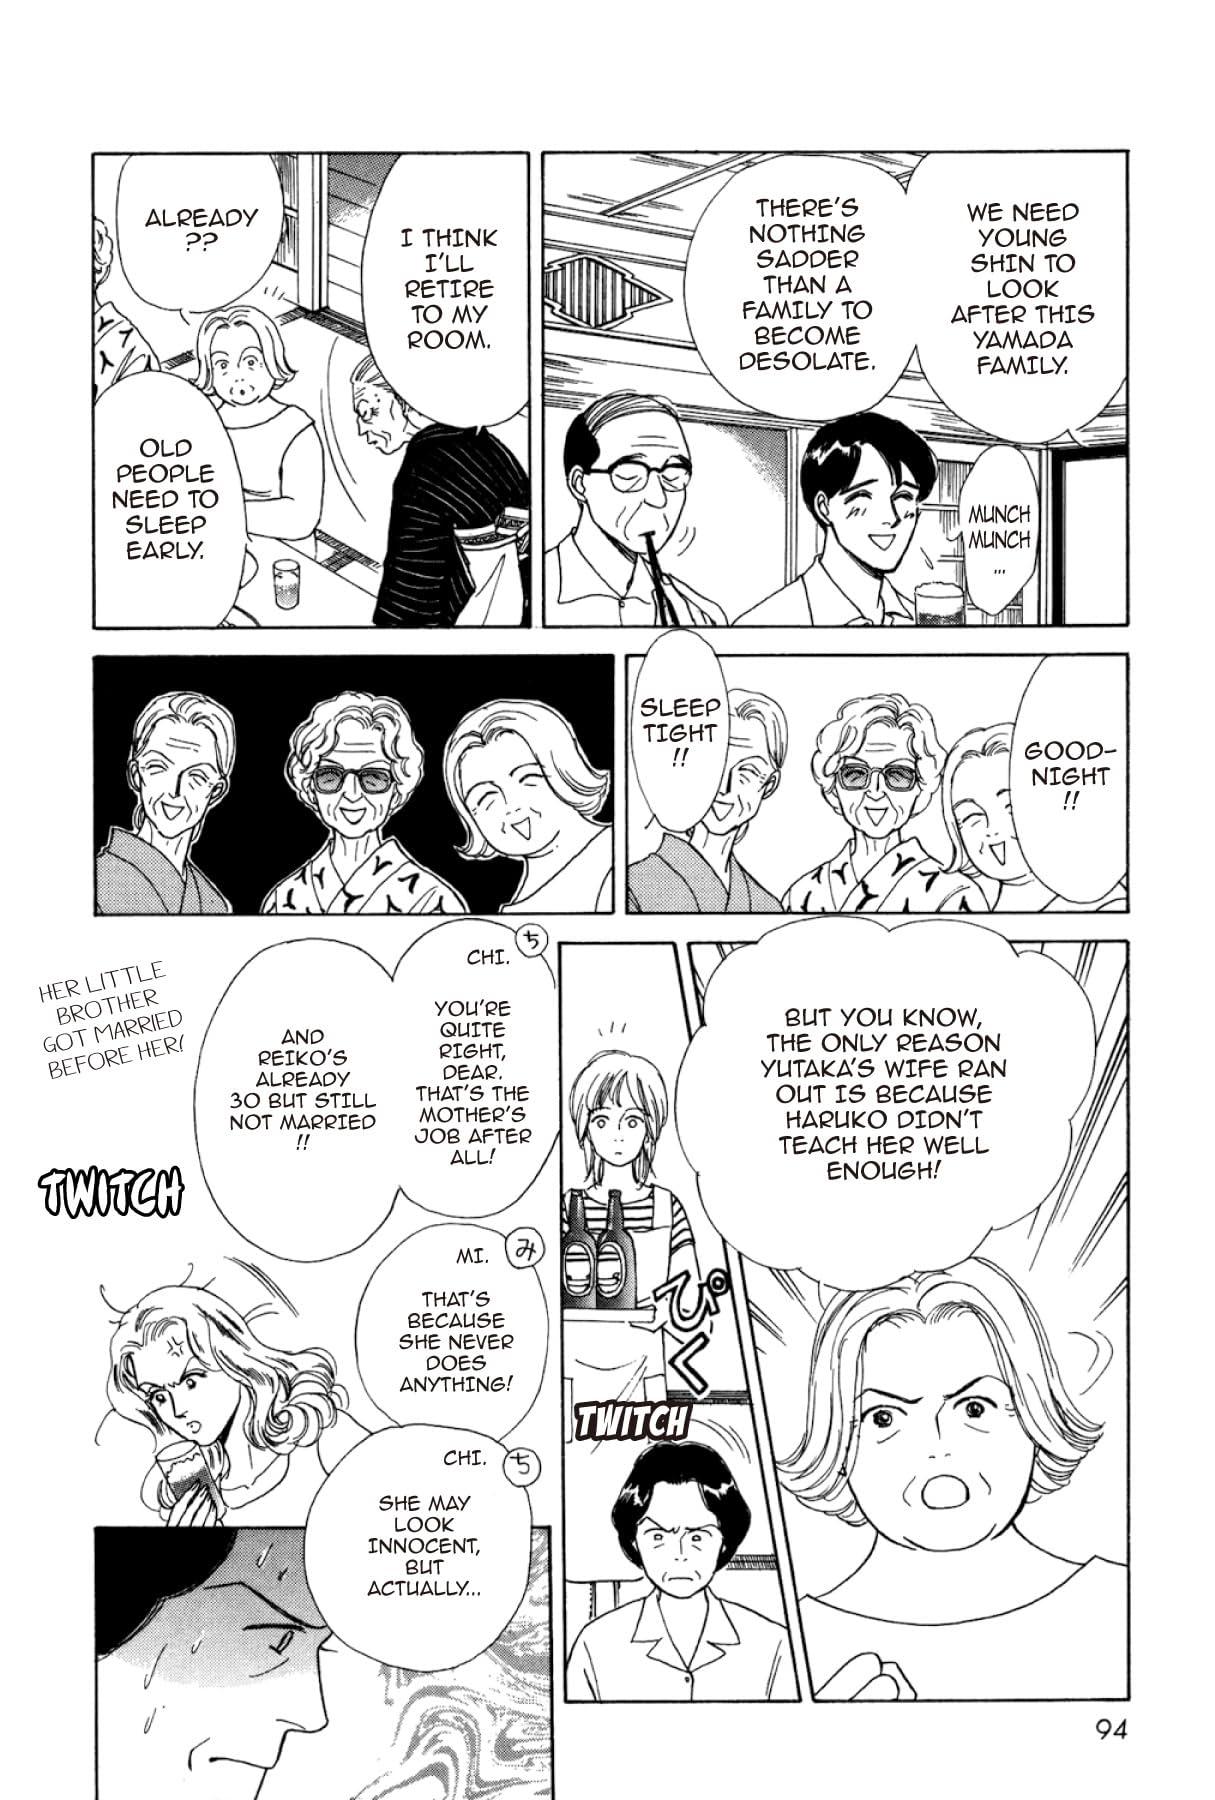 THE YAMADA WIFE #4